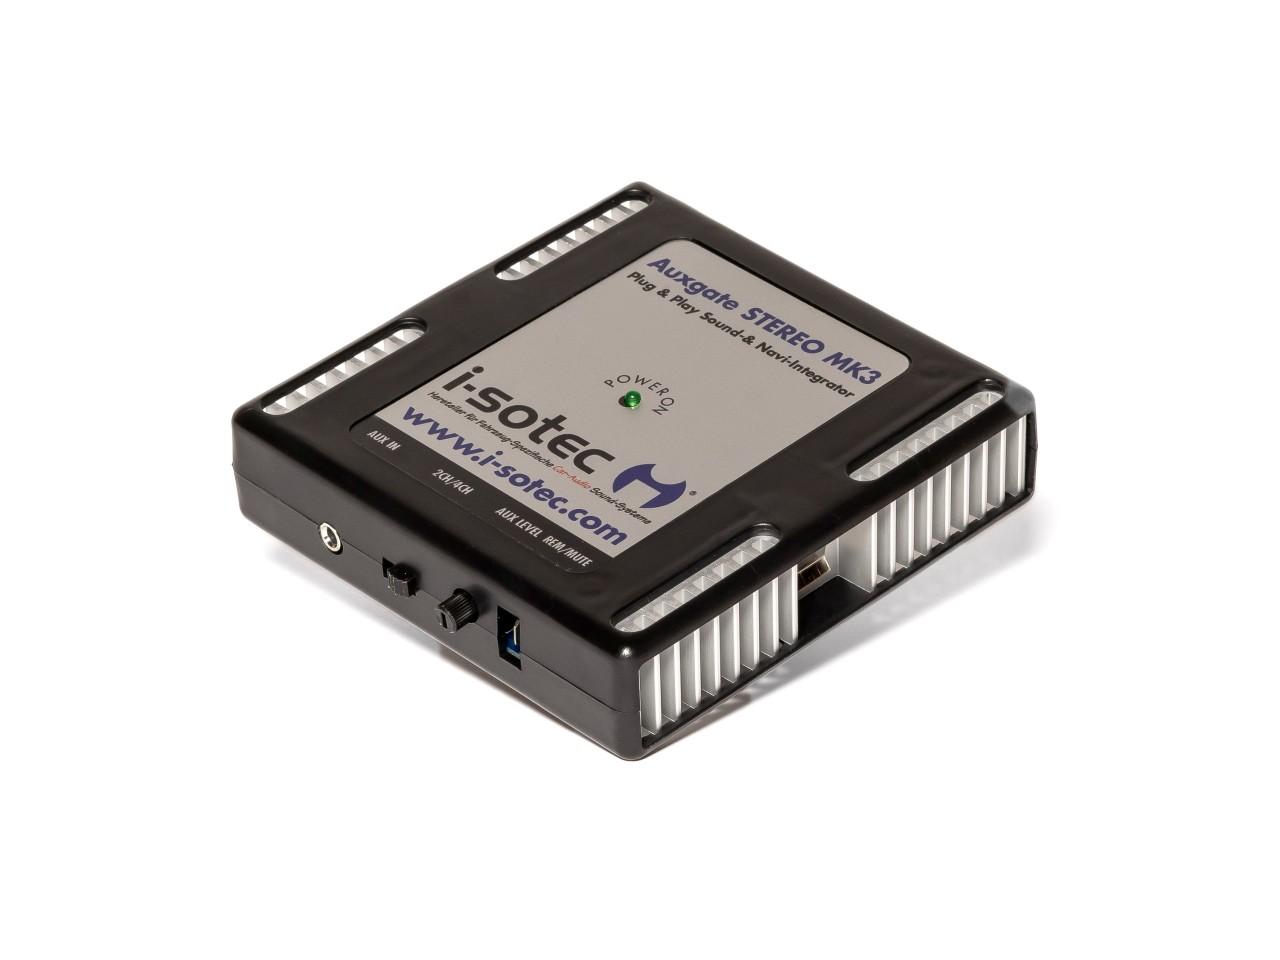 Auxgate Stereo | Mini-Verstärker mit Aux-Input | für iPhone, MP3, portable Navigation & Andere Geräte